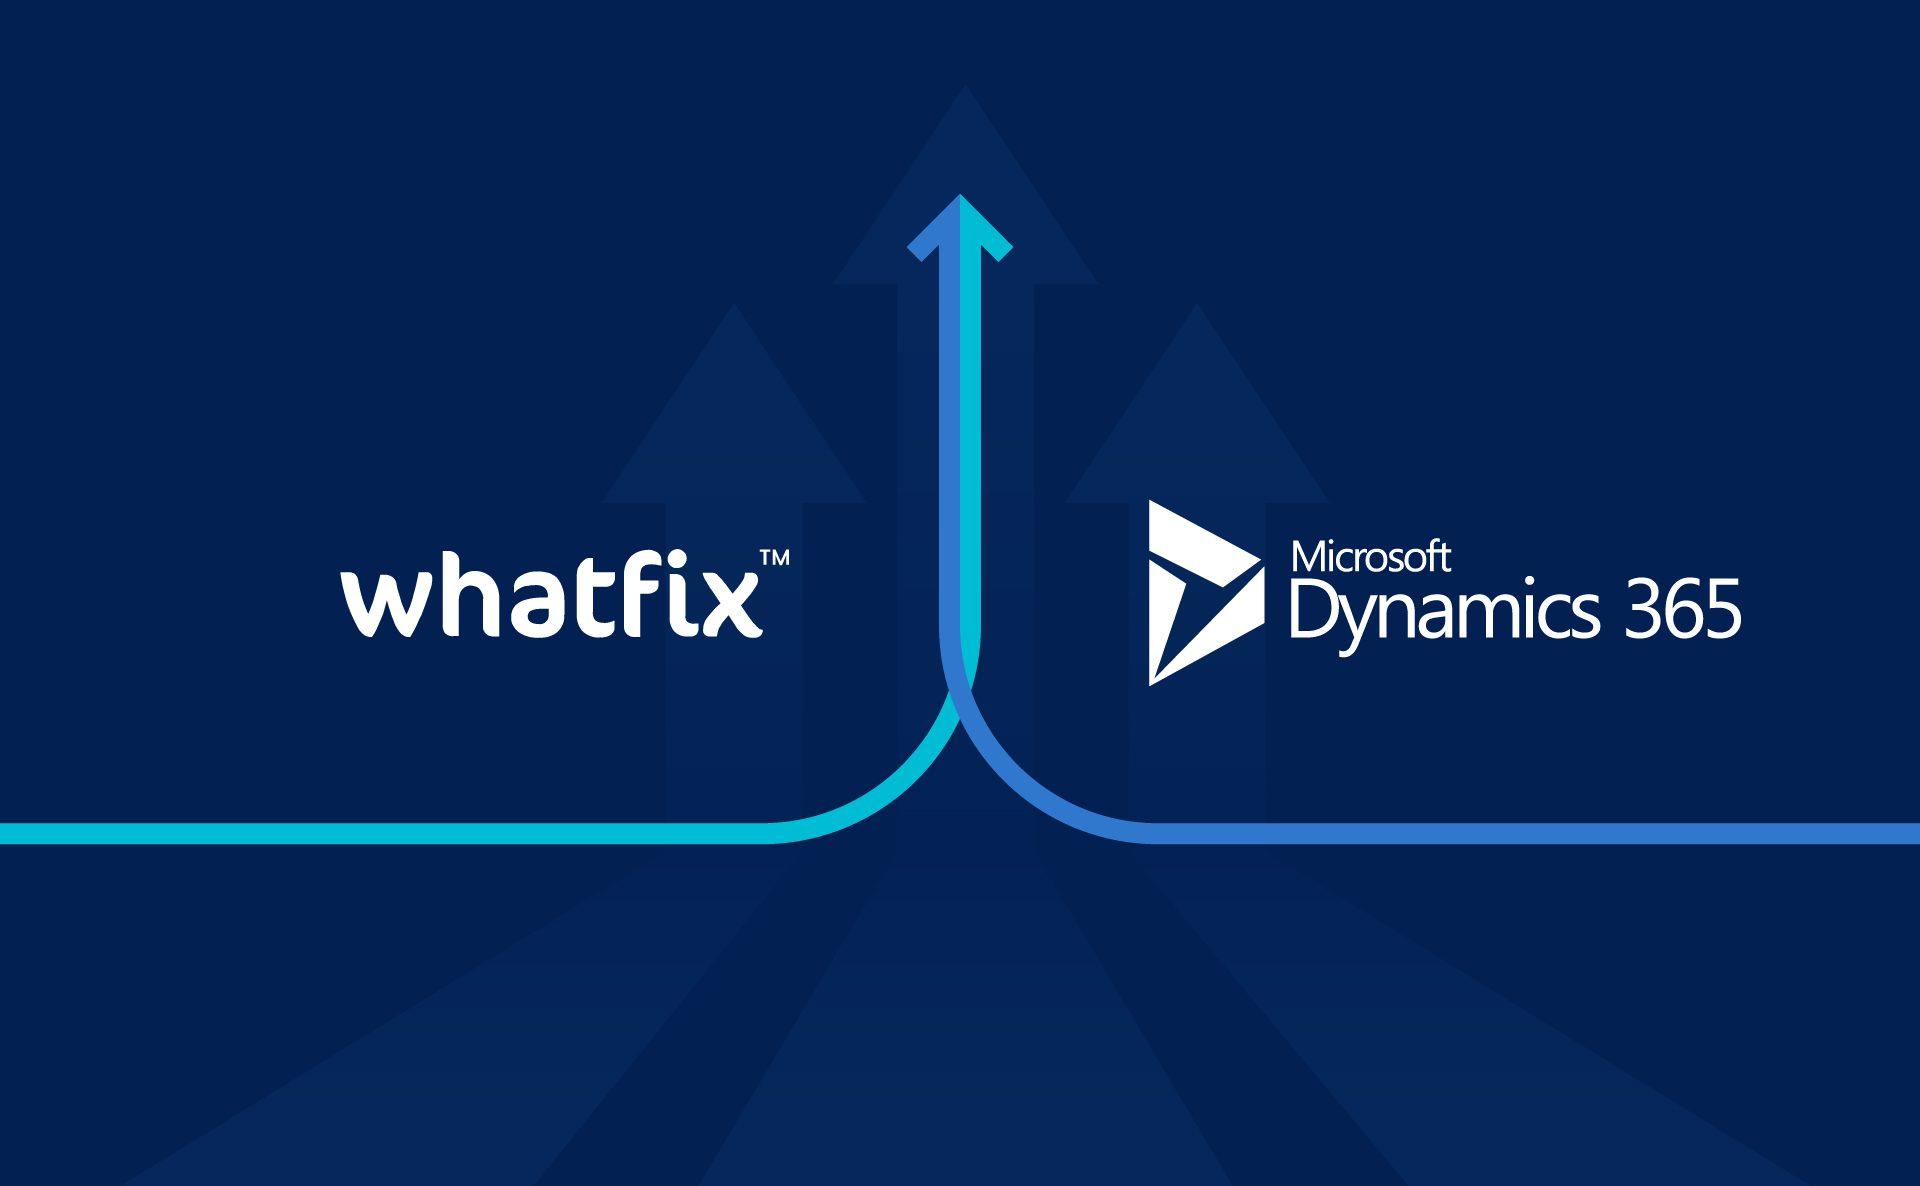 Whatfix Strengthens Partnership with Microsoft to Improve Digital Adoption - The Whatfix Blog | Drive Digital Adoption